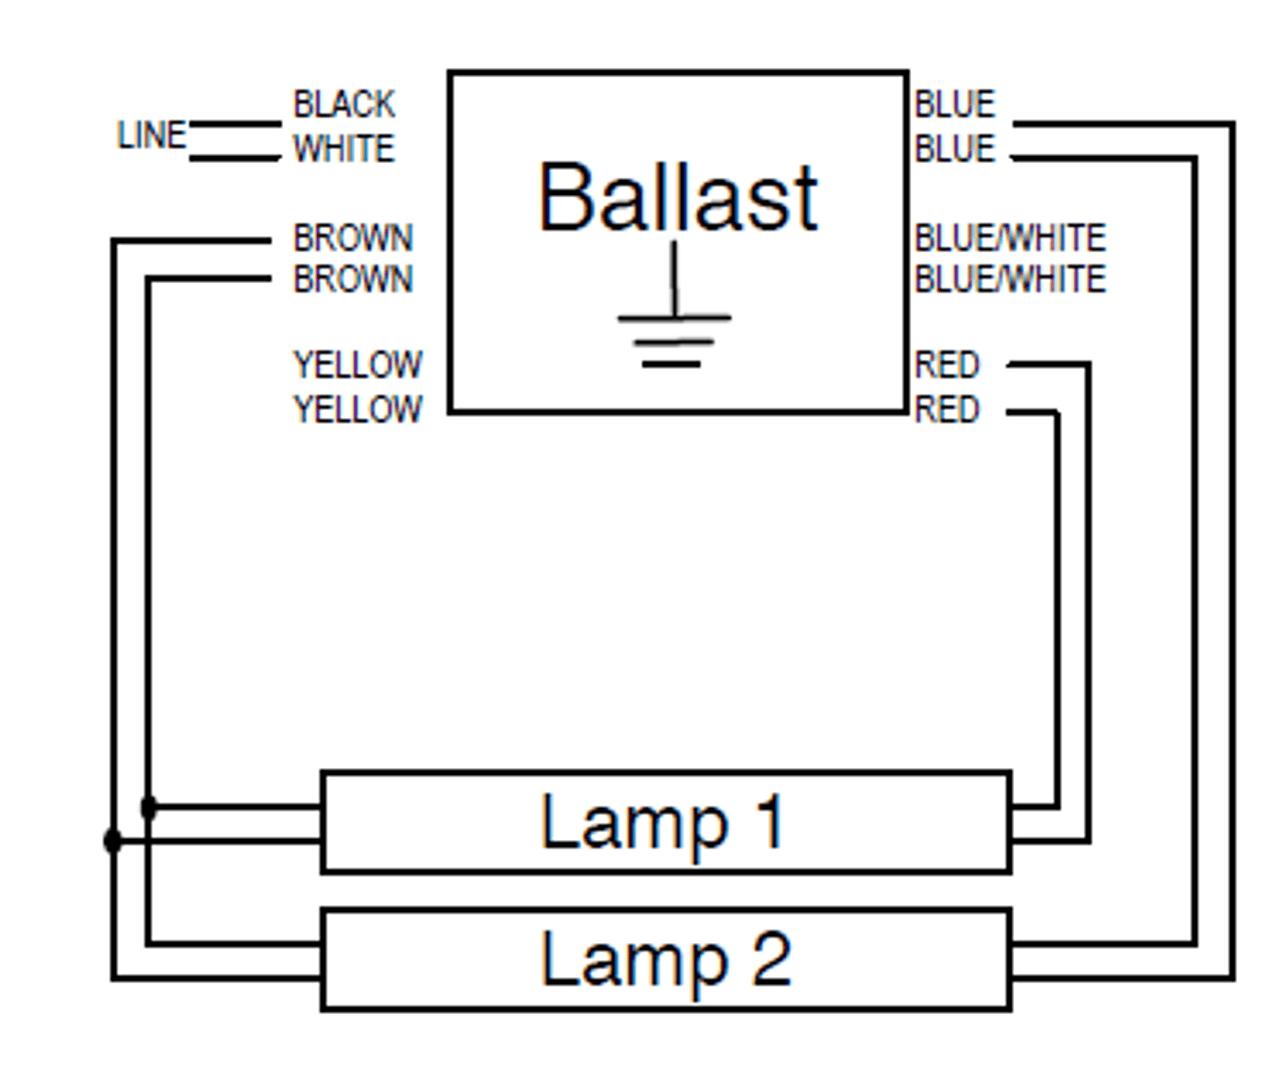 medium resolution of keystone ktsb 1224 24 1 tp magnetic sign ballast 12 to 24 total keystone ballasts wiring diagram sign